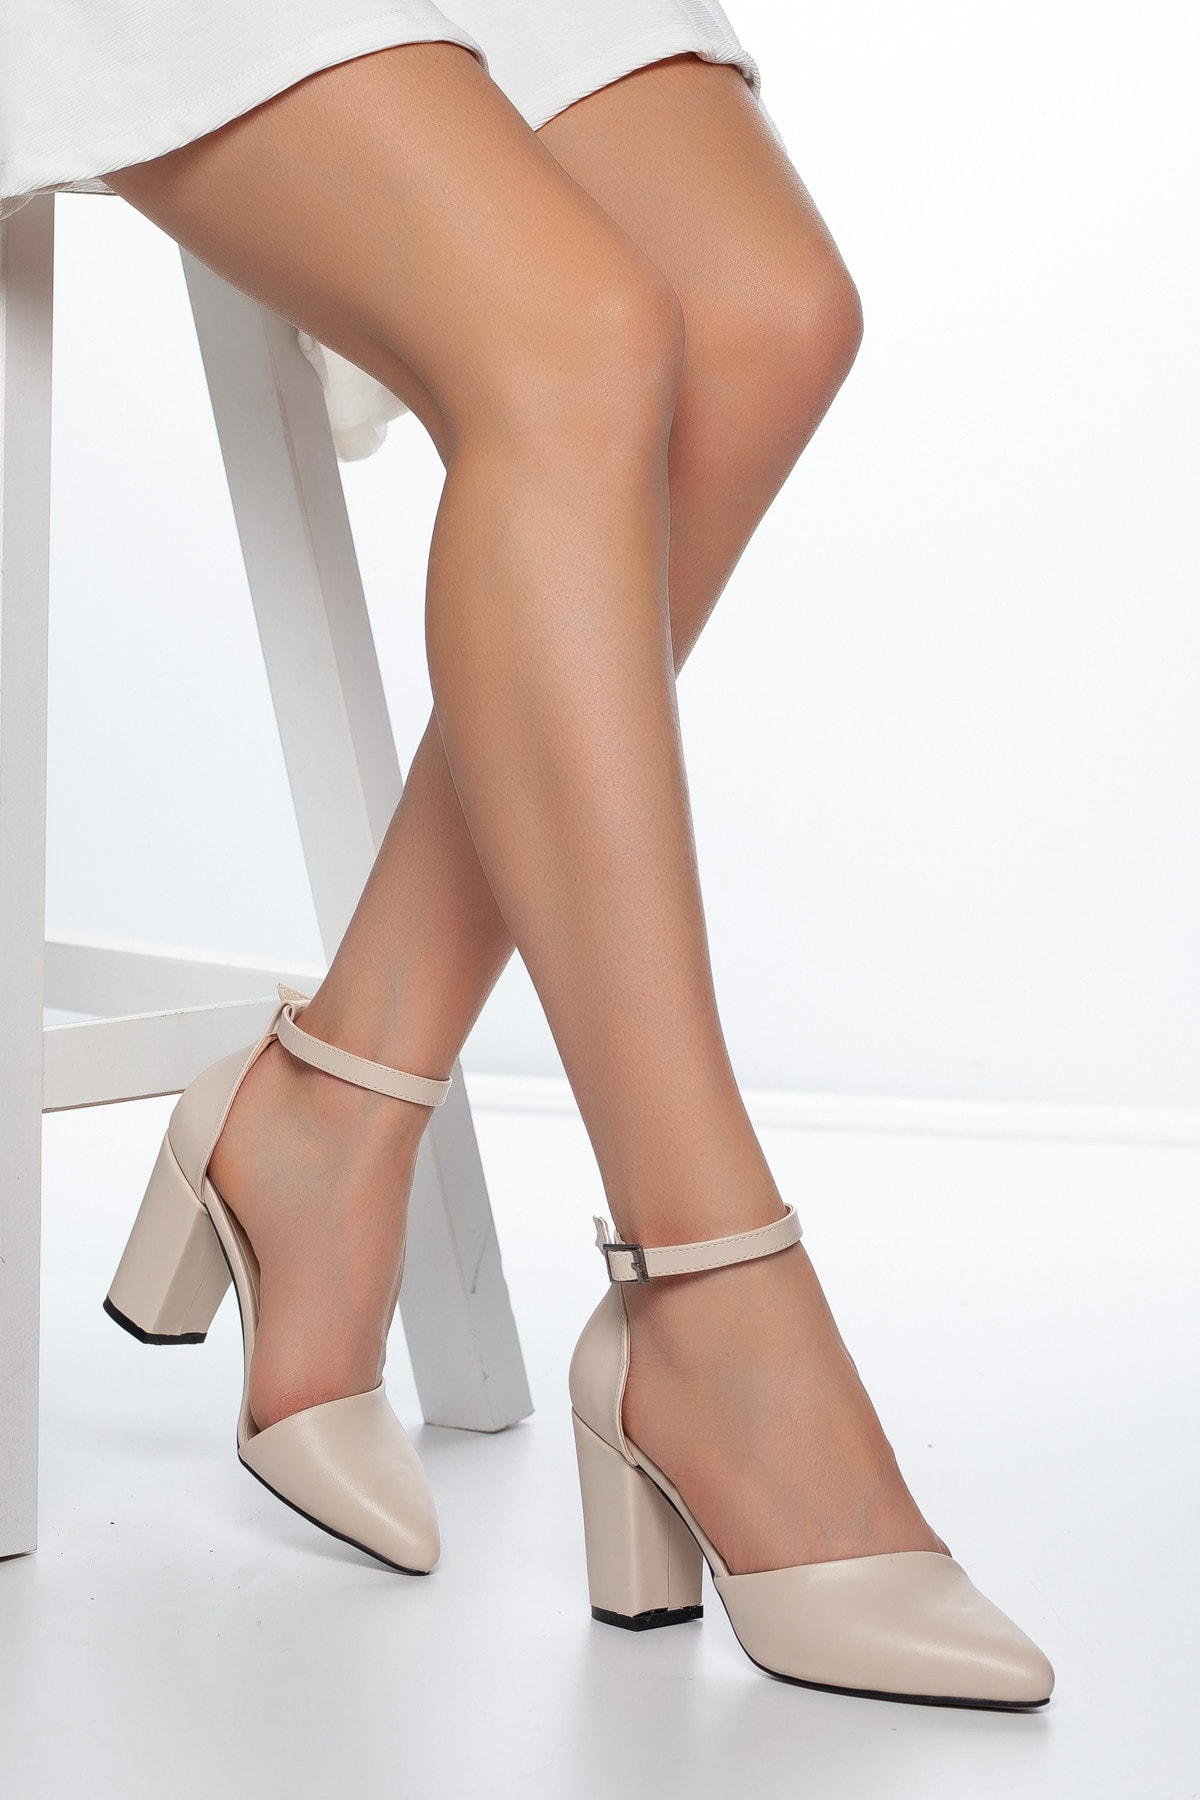 Daxtors Vizon Kadın Ayakkabı DXTRSKRNYRKY002 1